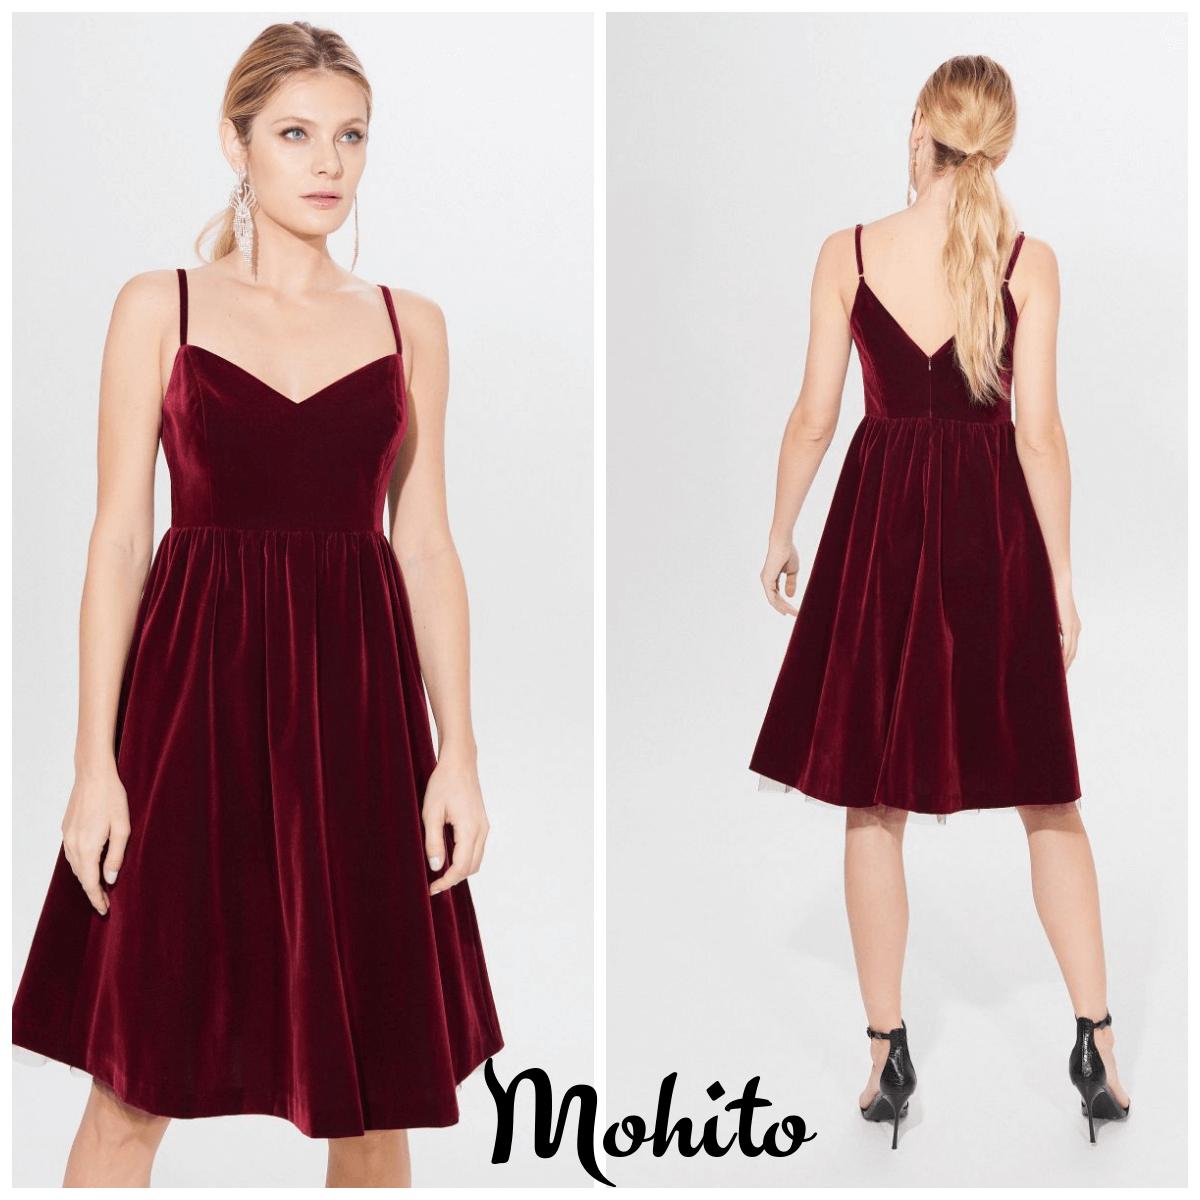 studniówka 2020 sukienka Mohito